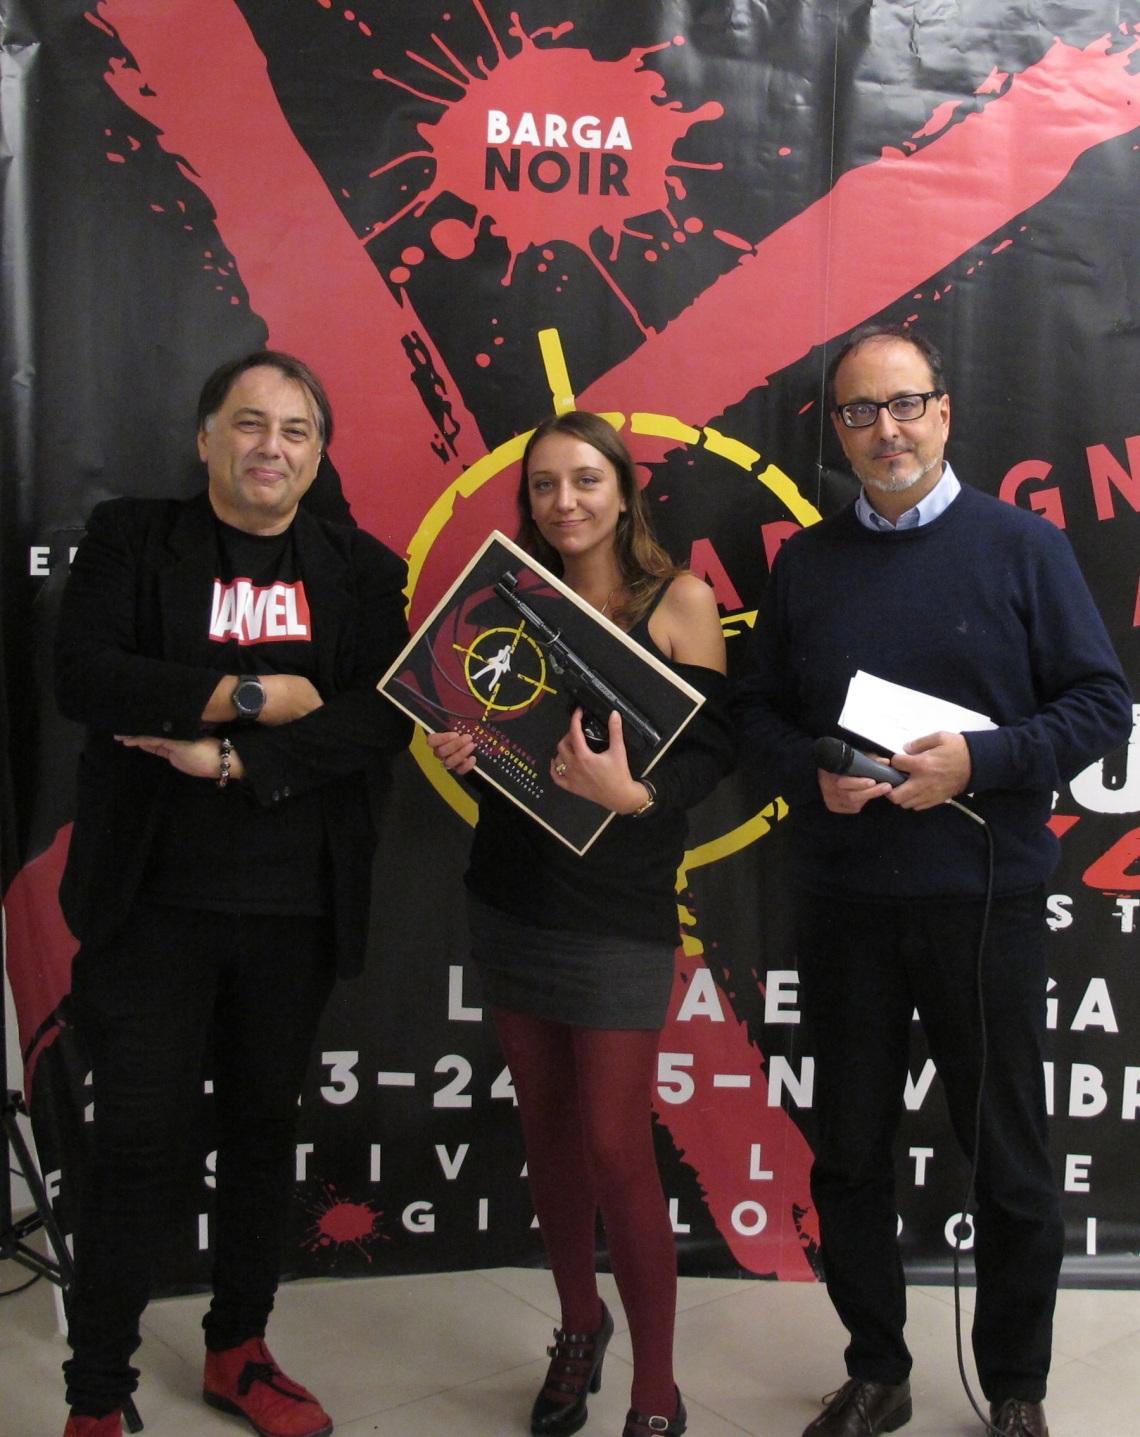 francesca-bertuzzi-giallo-noir-2018